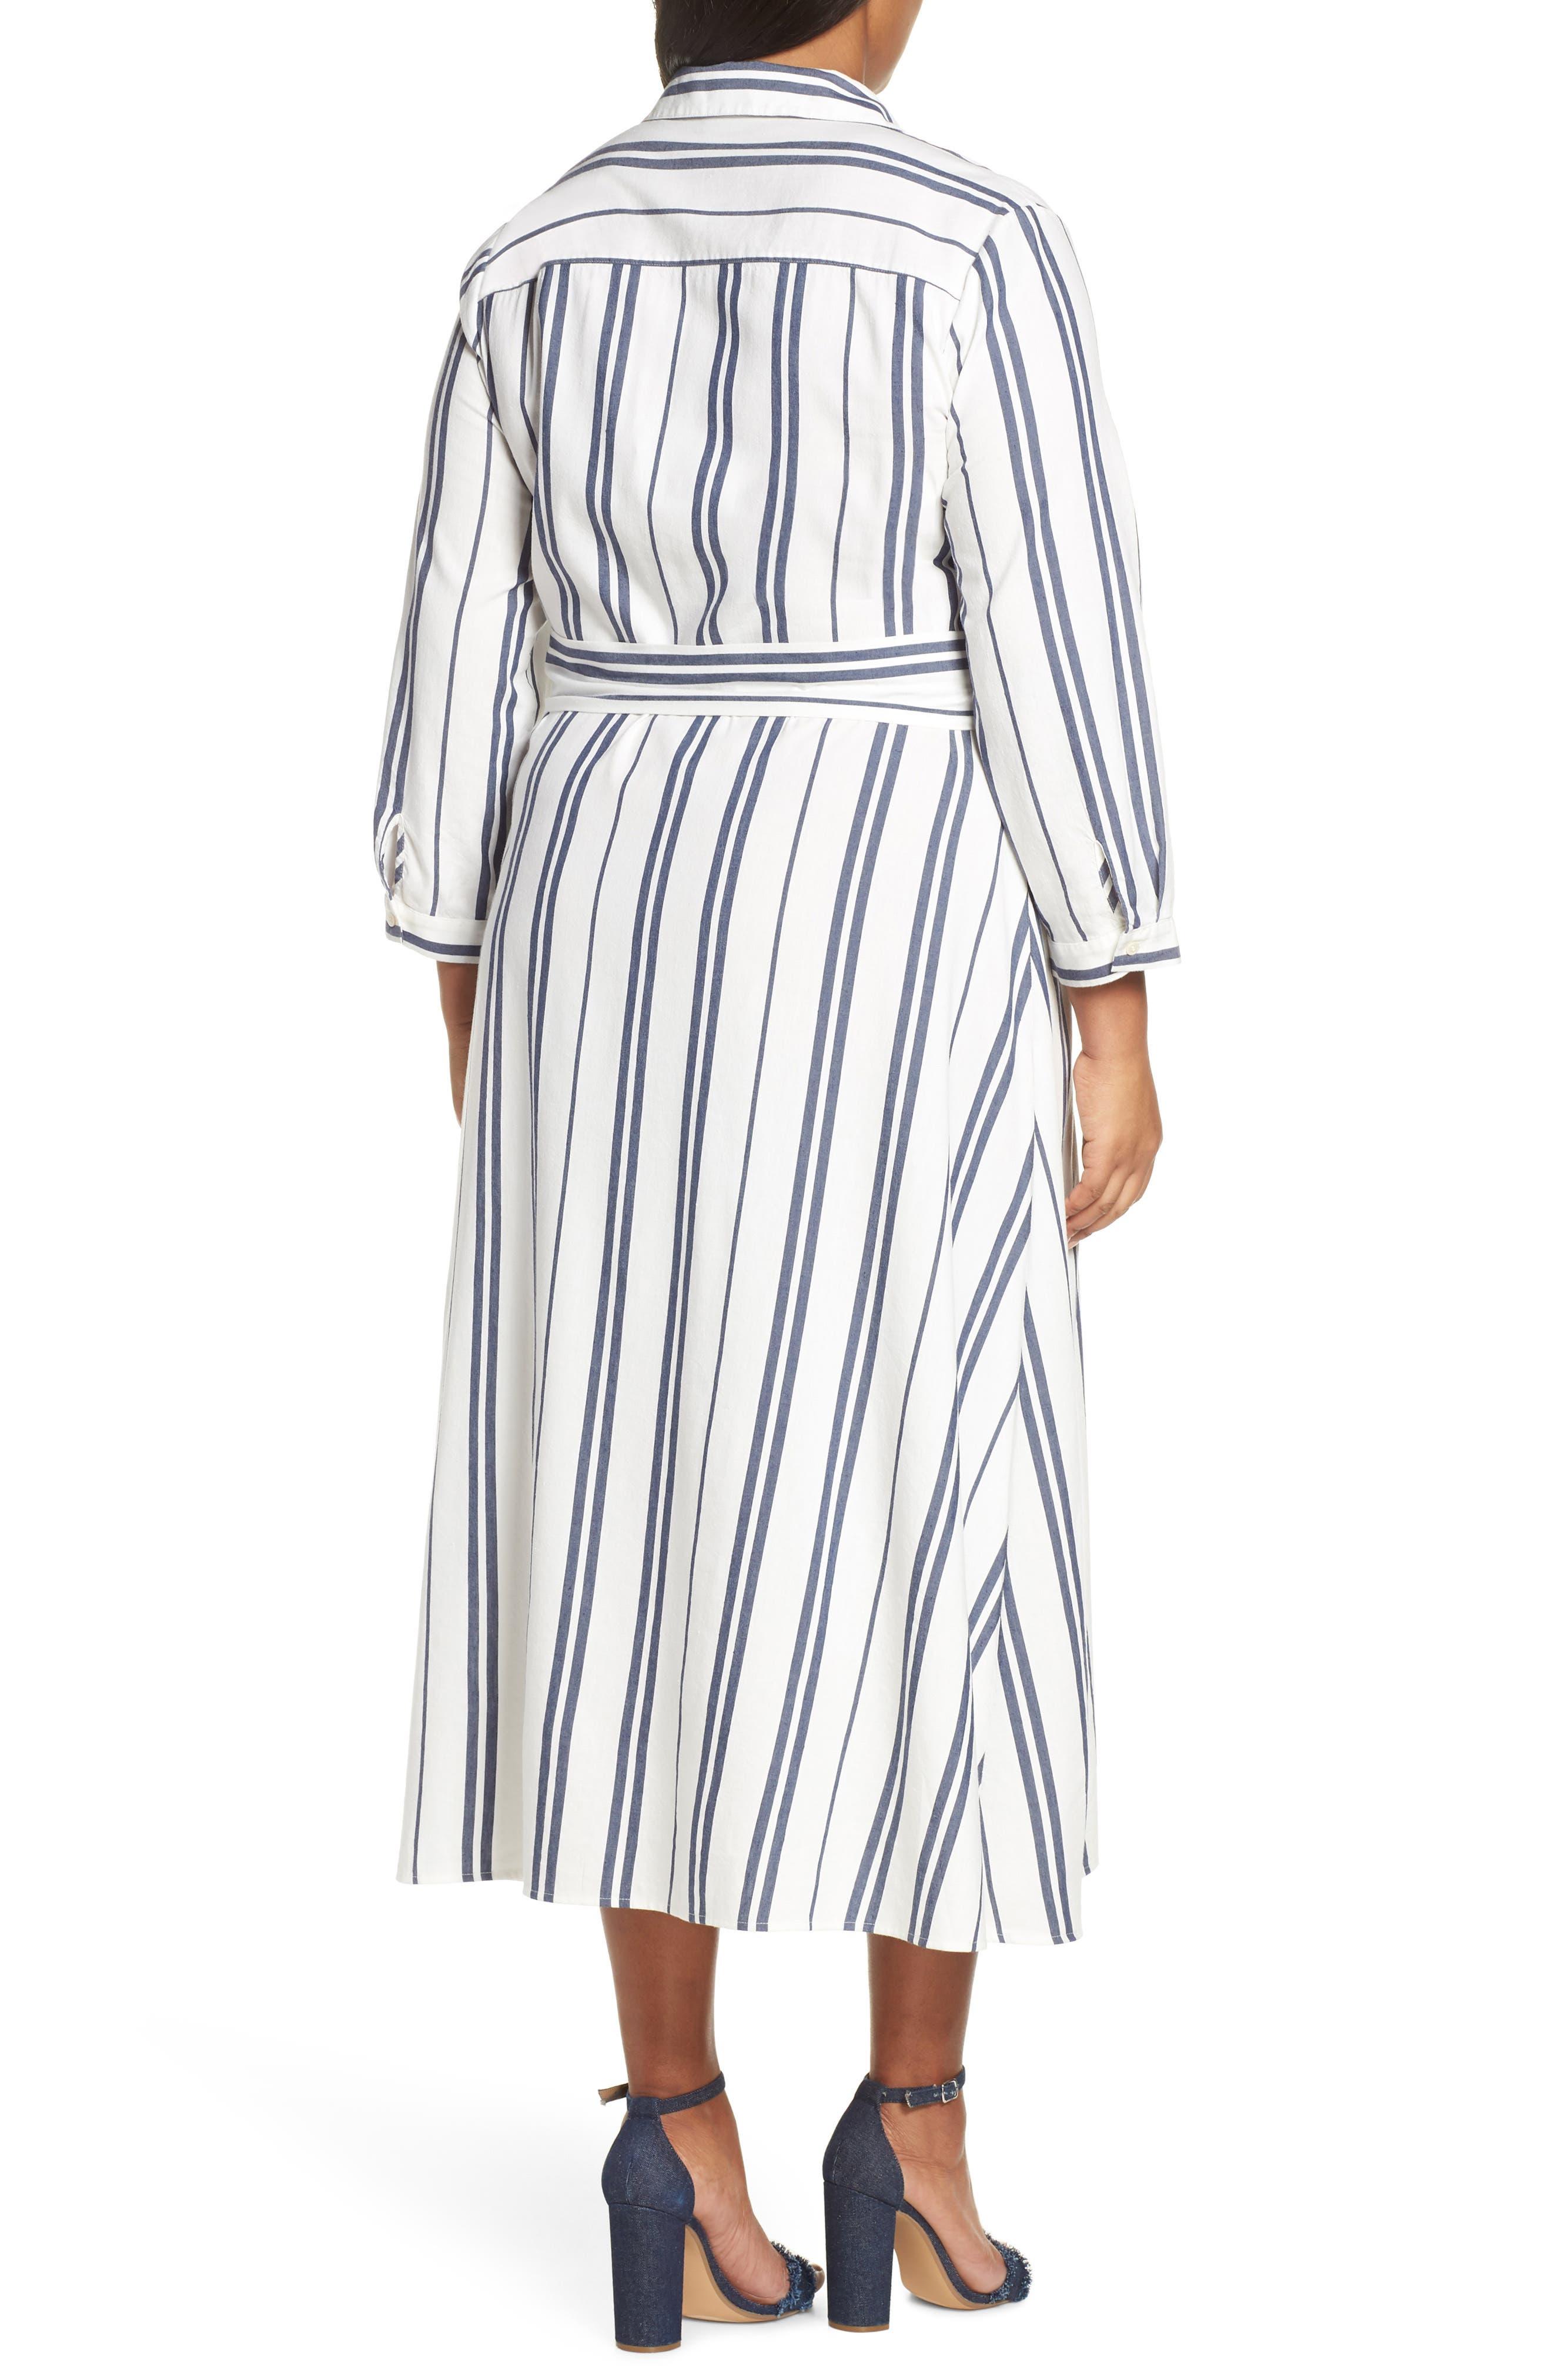 VINCE CAMUTO, Valiant Stripe Midi Shirtdress, Alternate thumbnail 2, color, PEARL IVORY